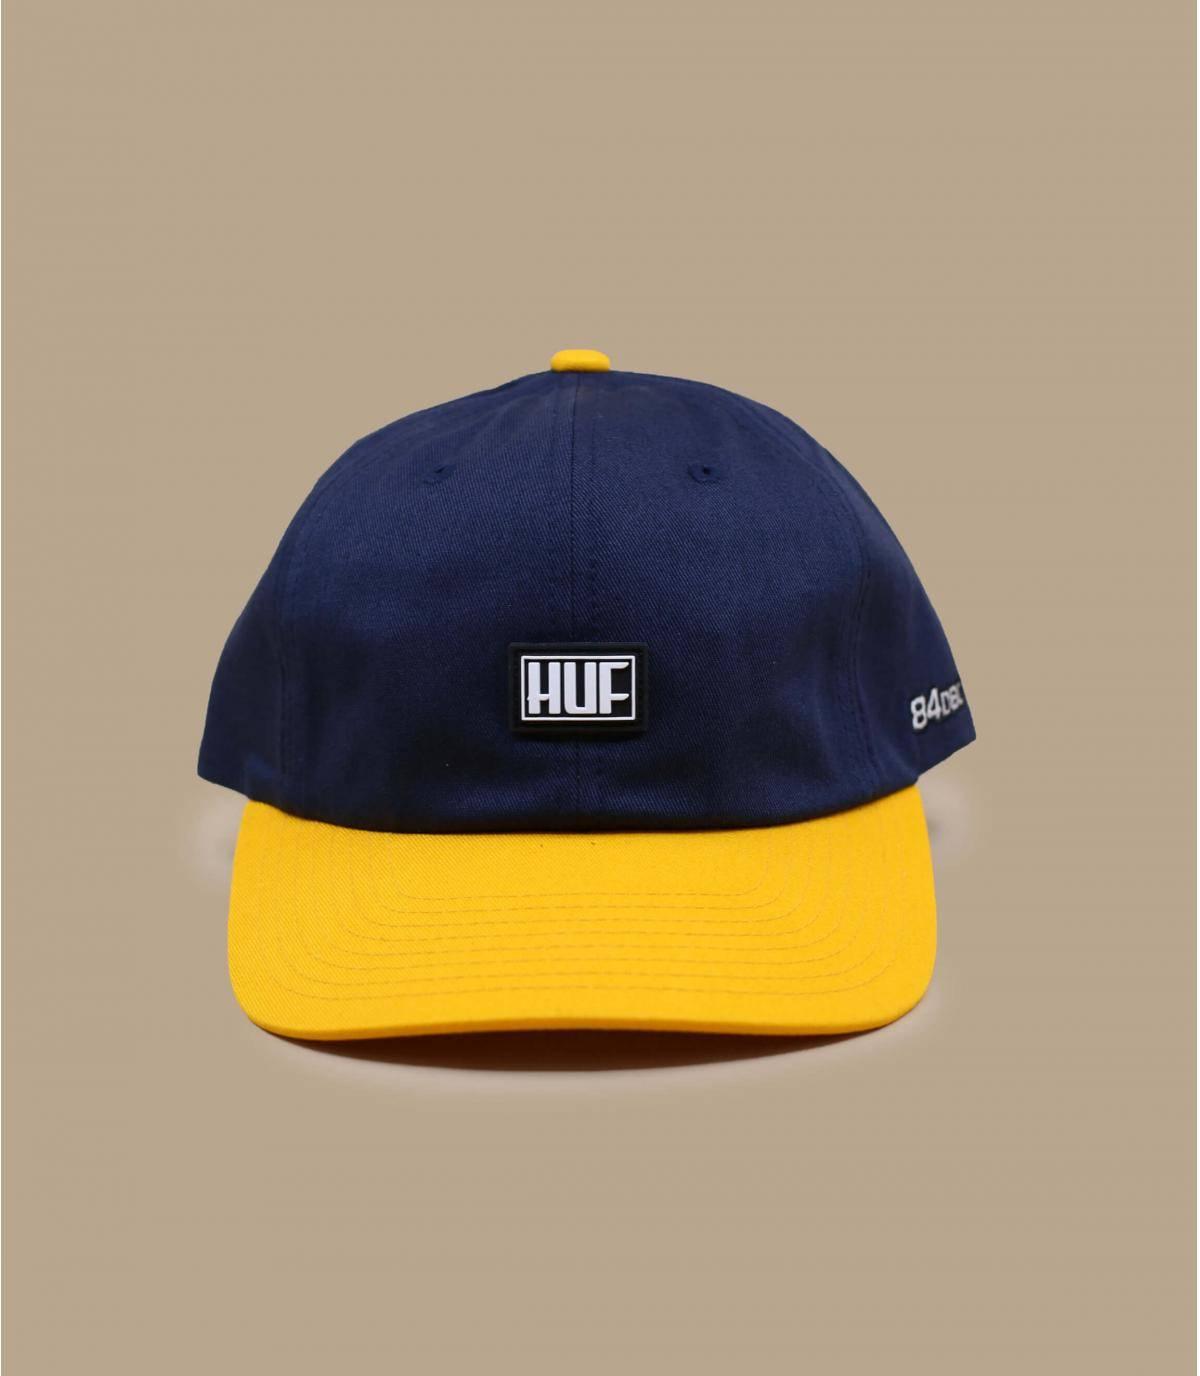 casquette Huf bleu jaune